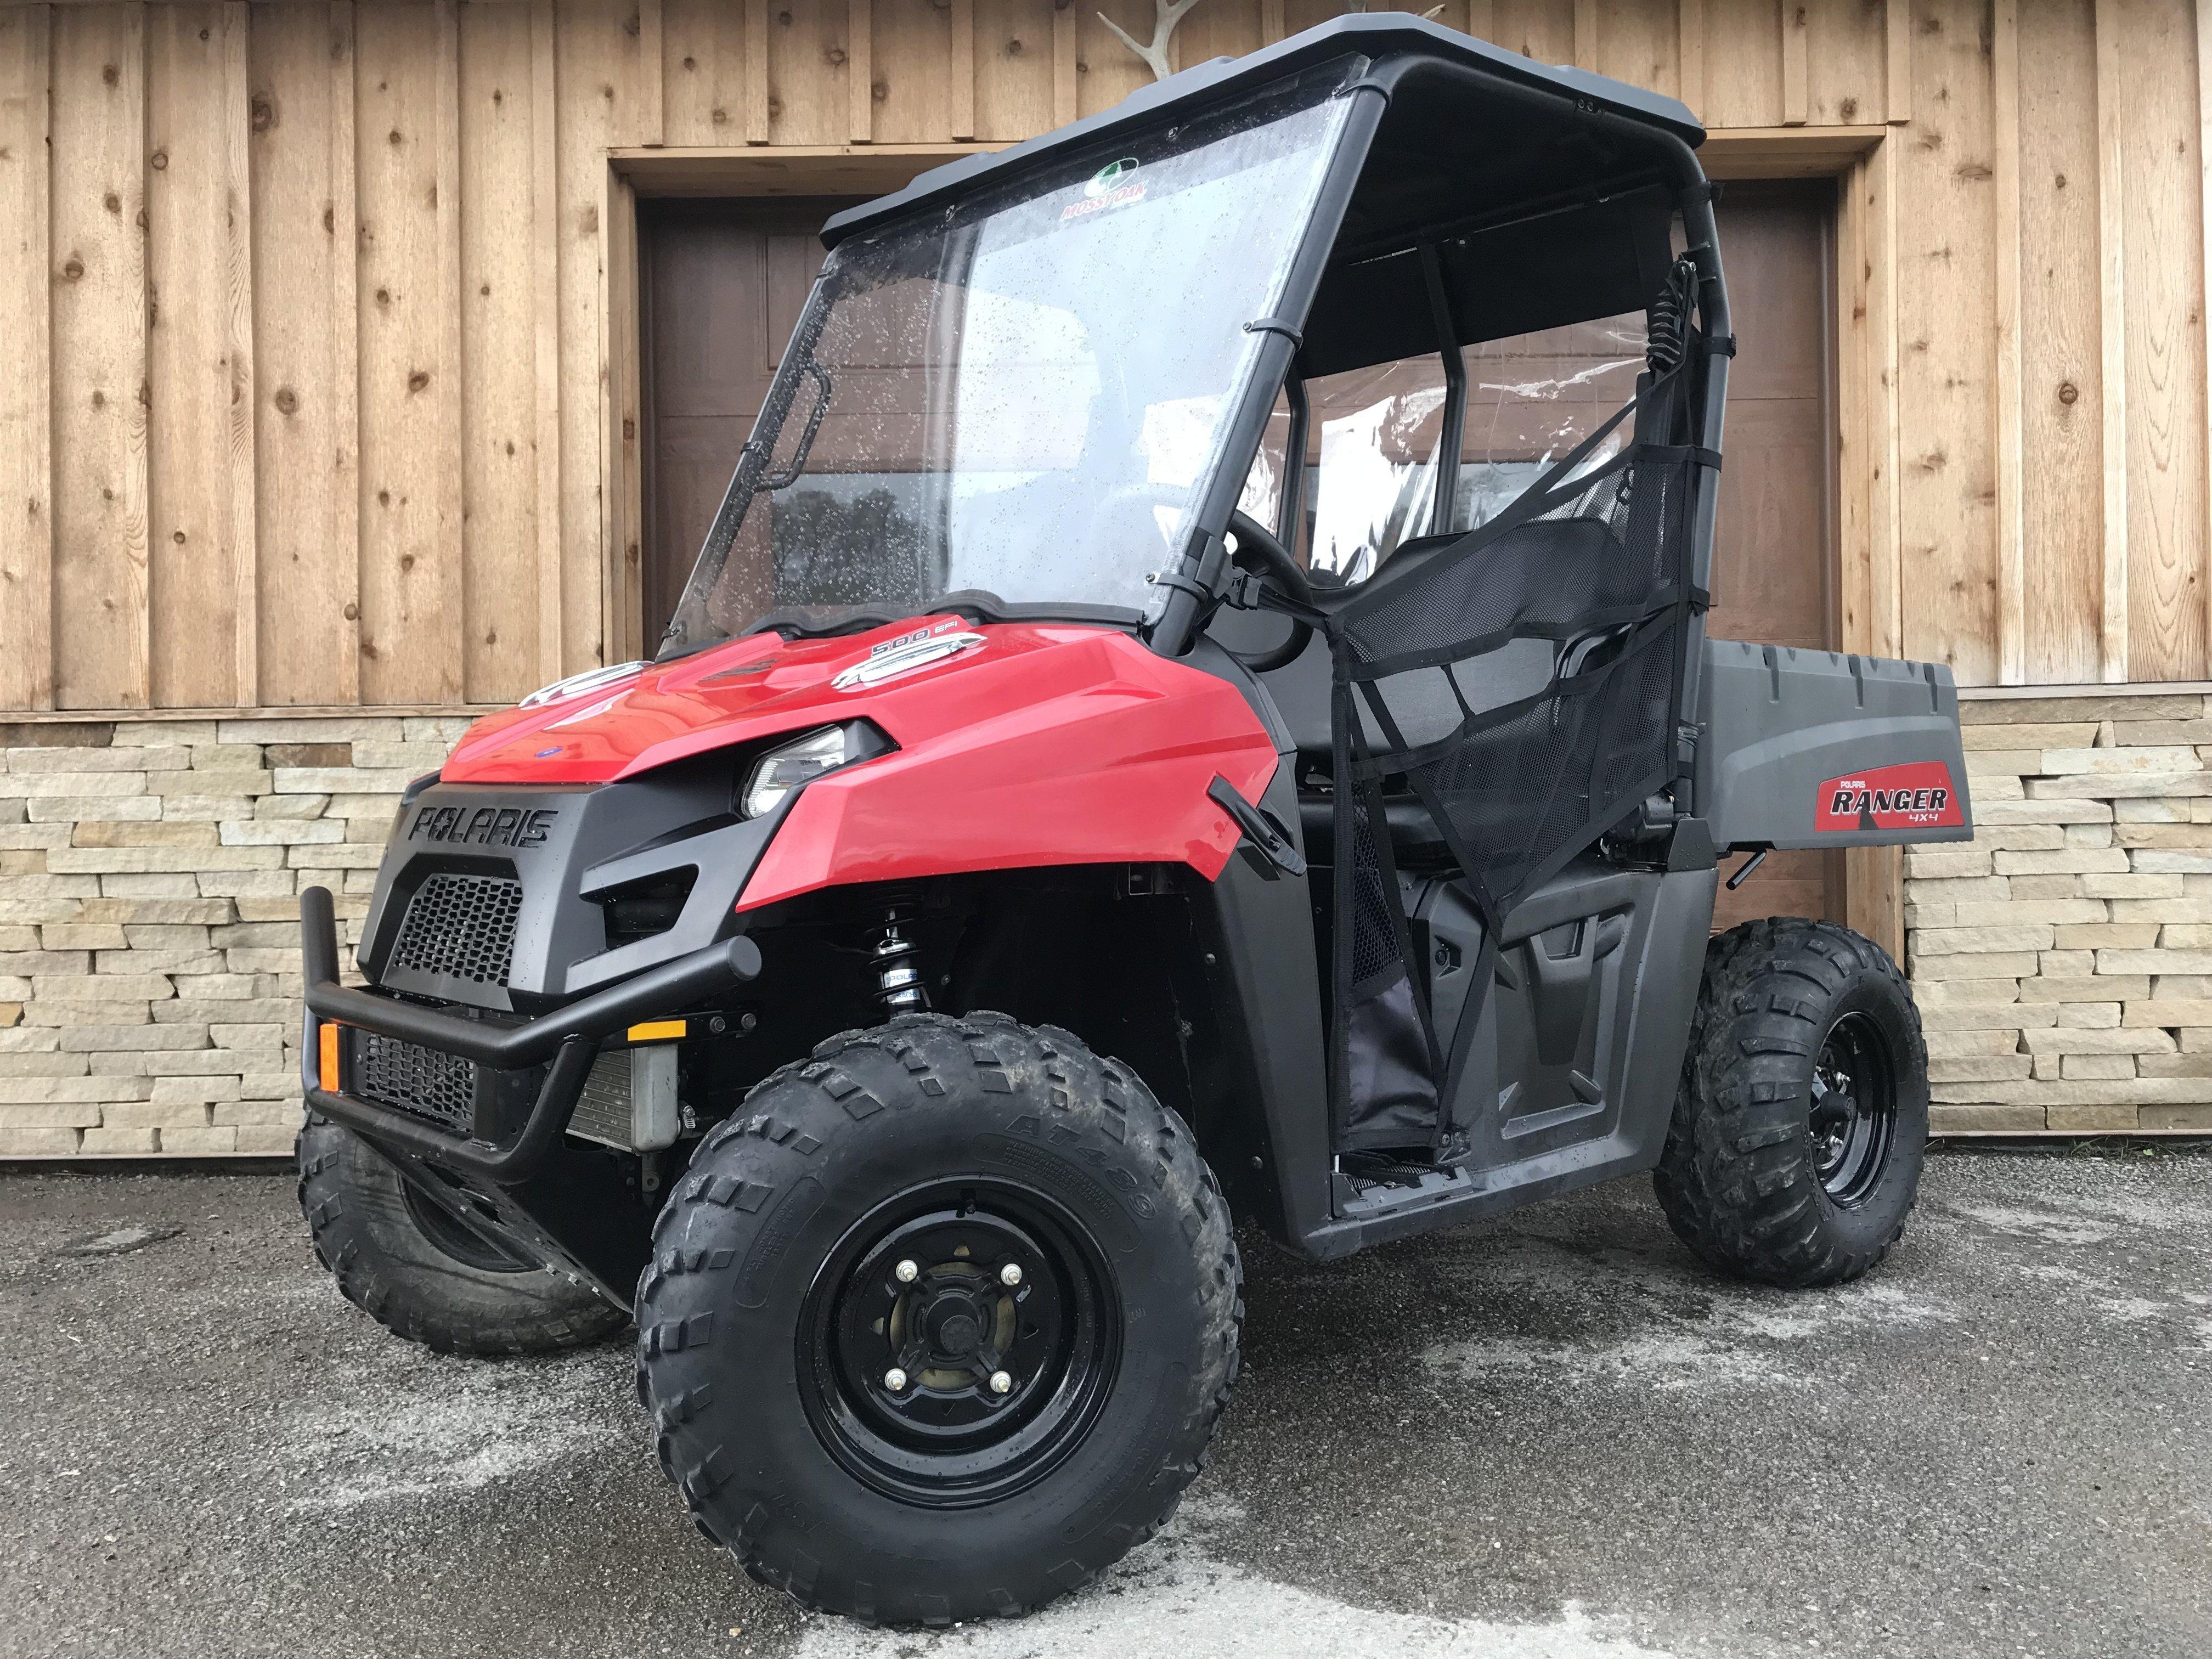 2013 Polaris Ranger 500 EFI Midsize 79480